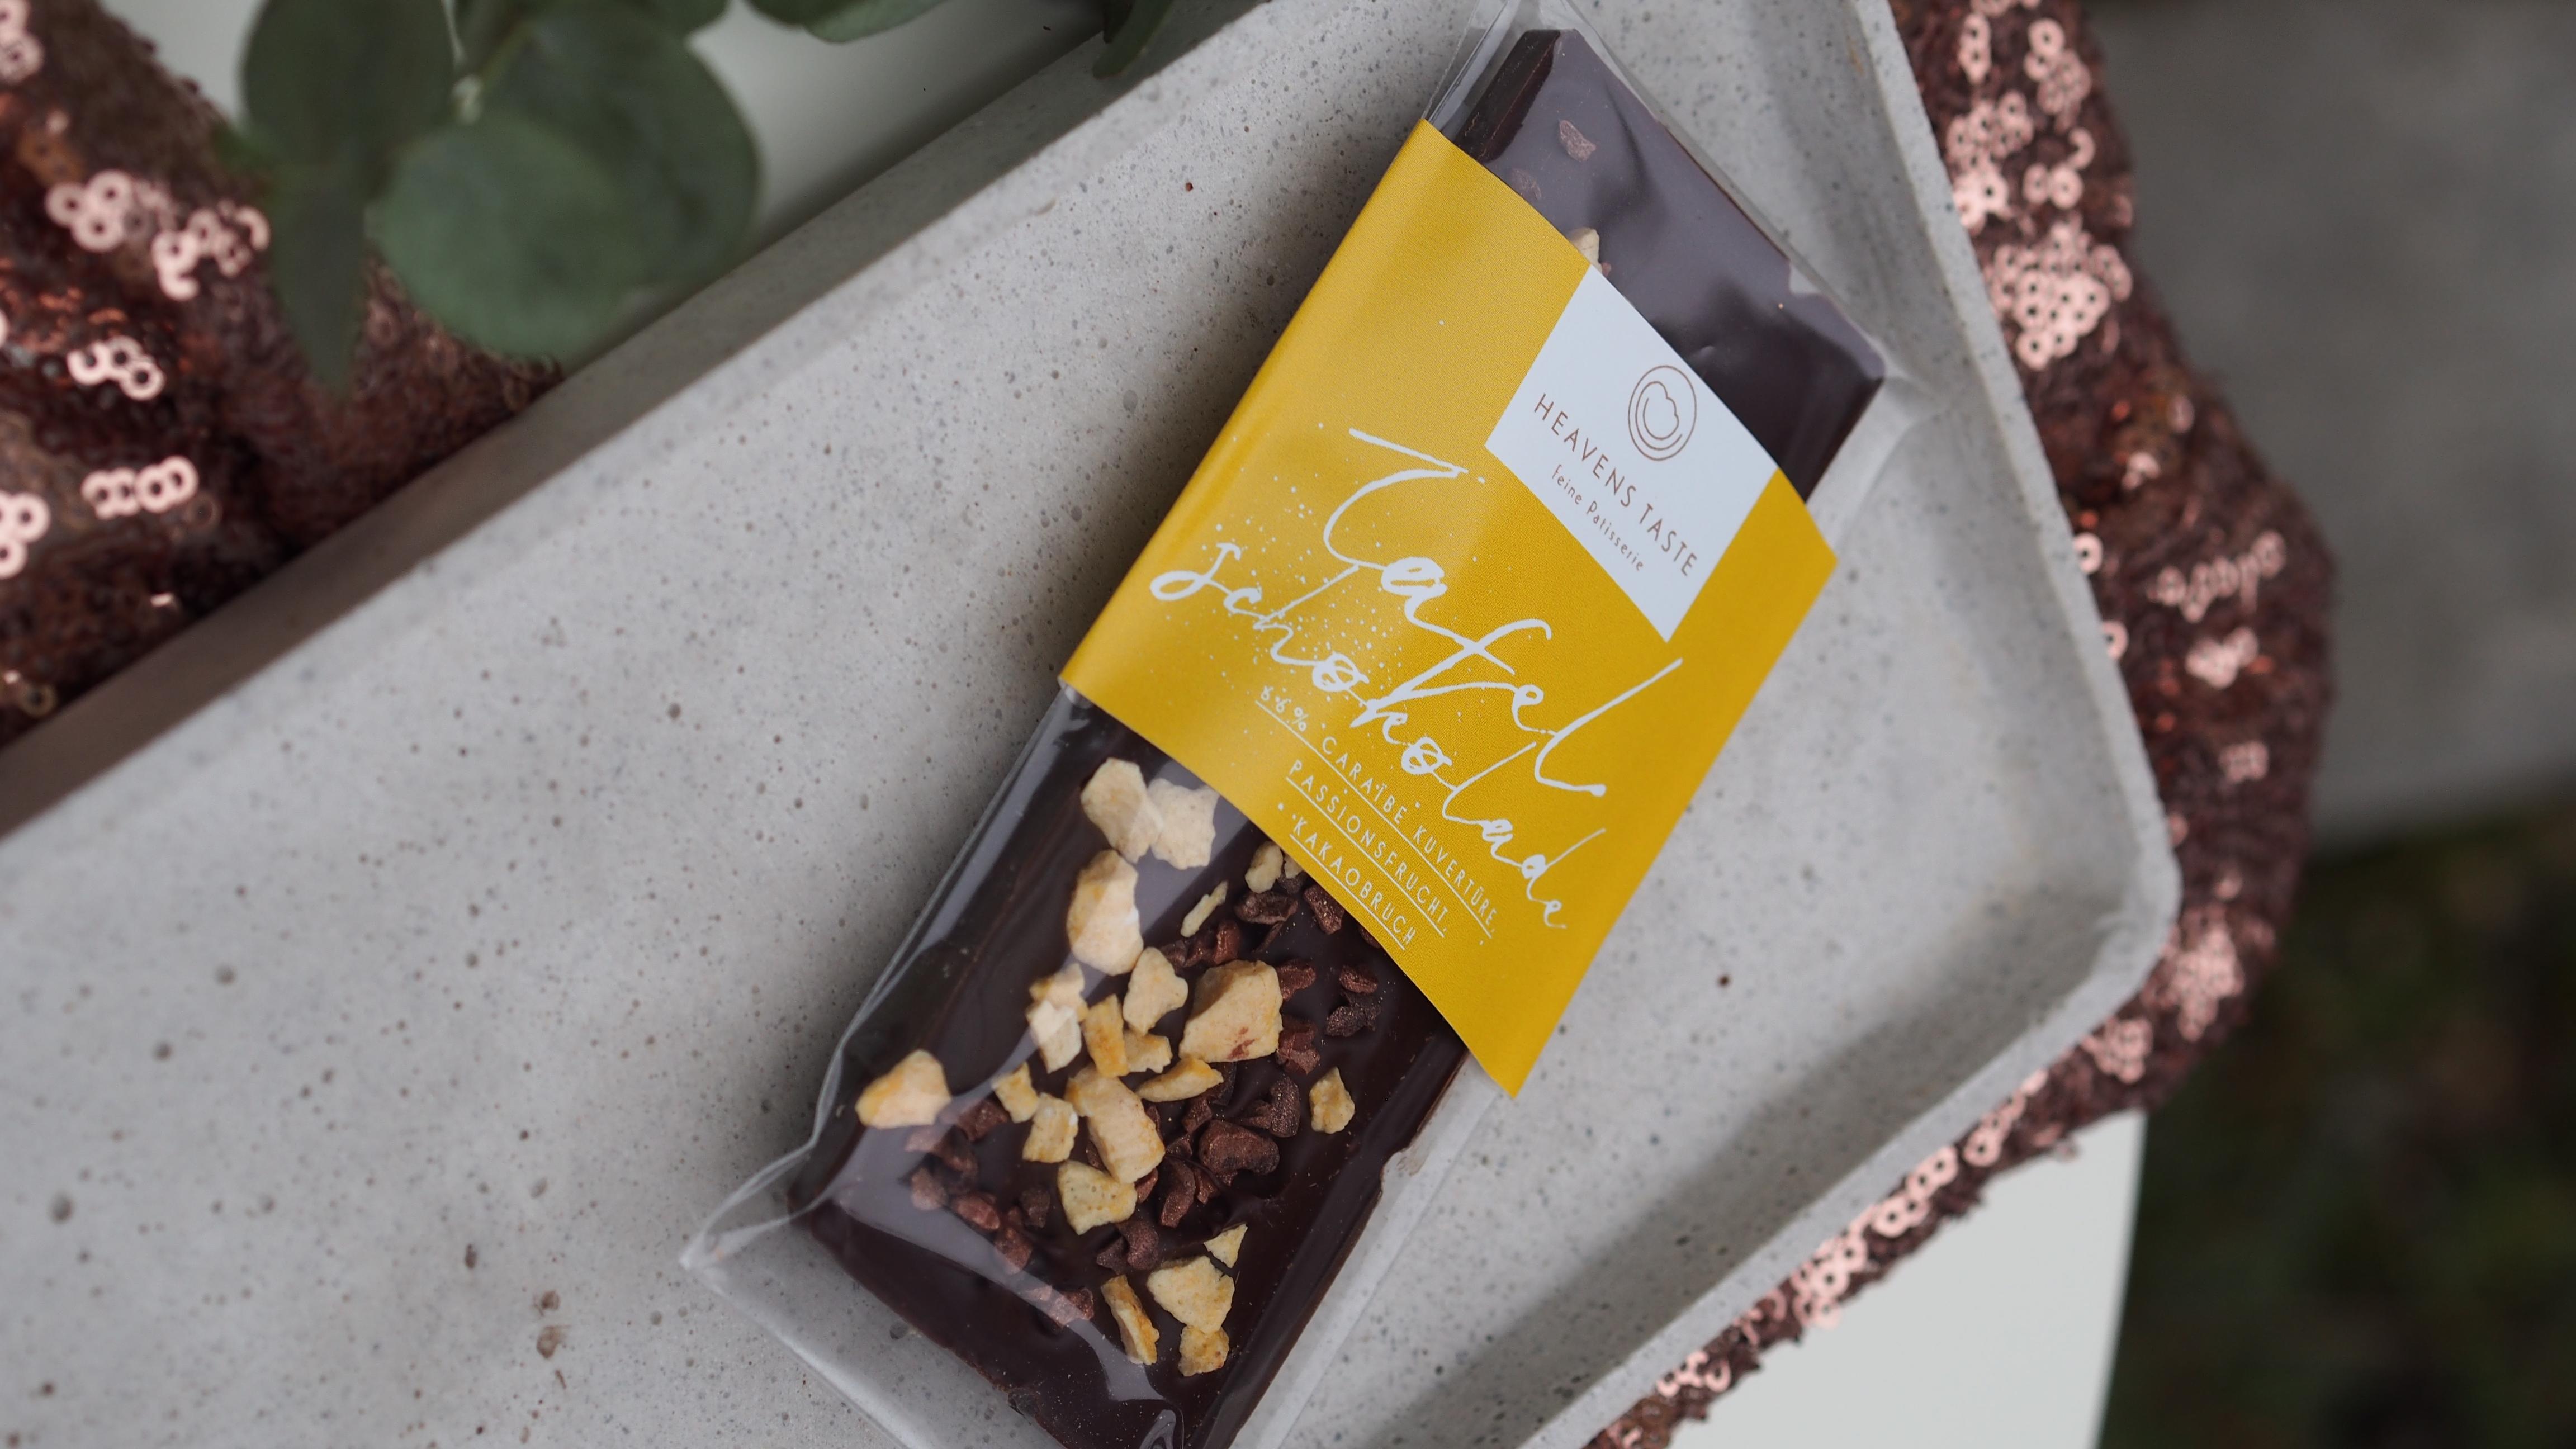 Tafelschokolade 66% Caraiibe mit Passionfrucht und Crue de Cacao, VEGAN, 50 Gramm